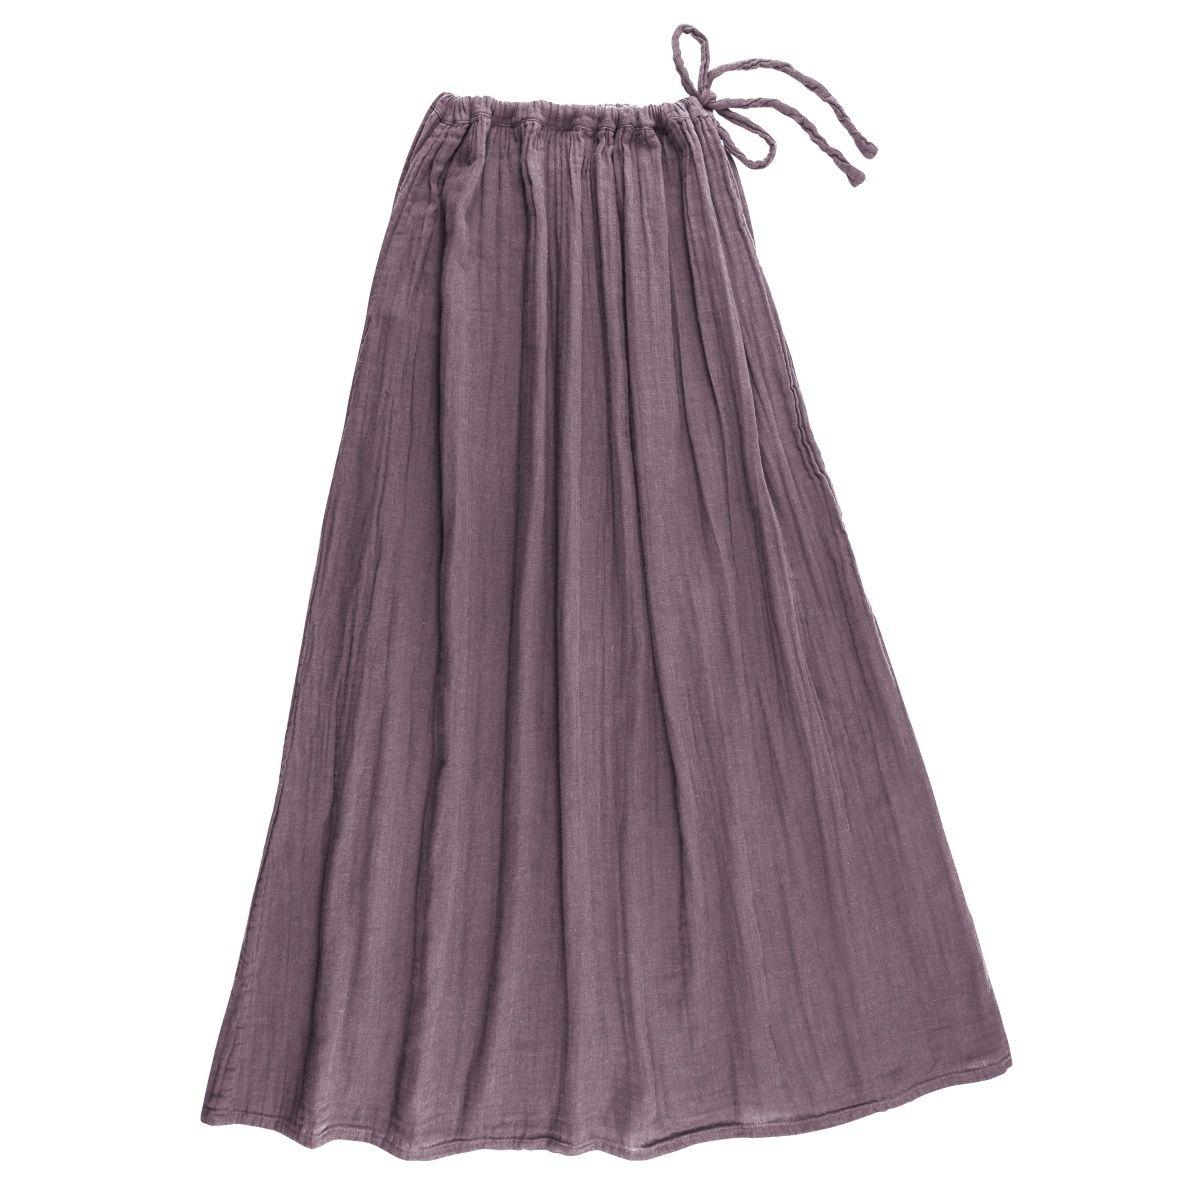 Numero 74 Skirt for mum Ava long dusty lilac